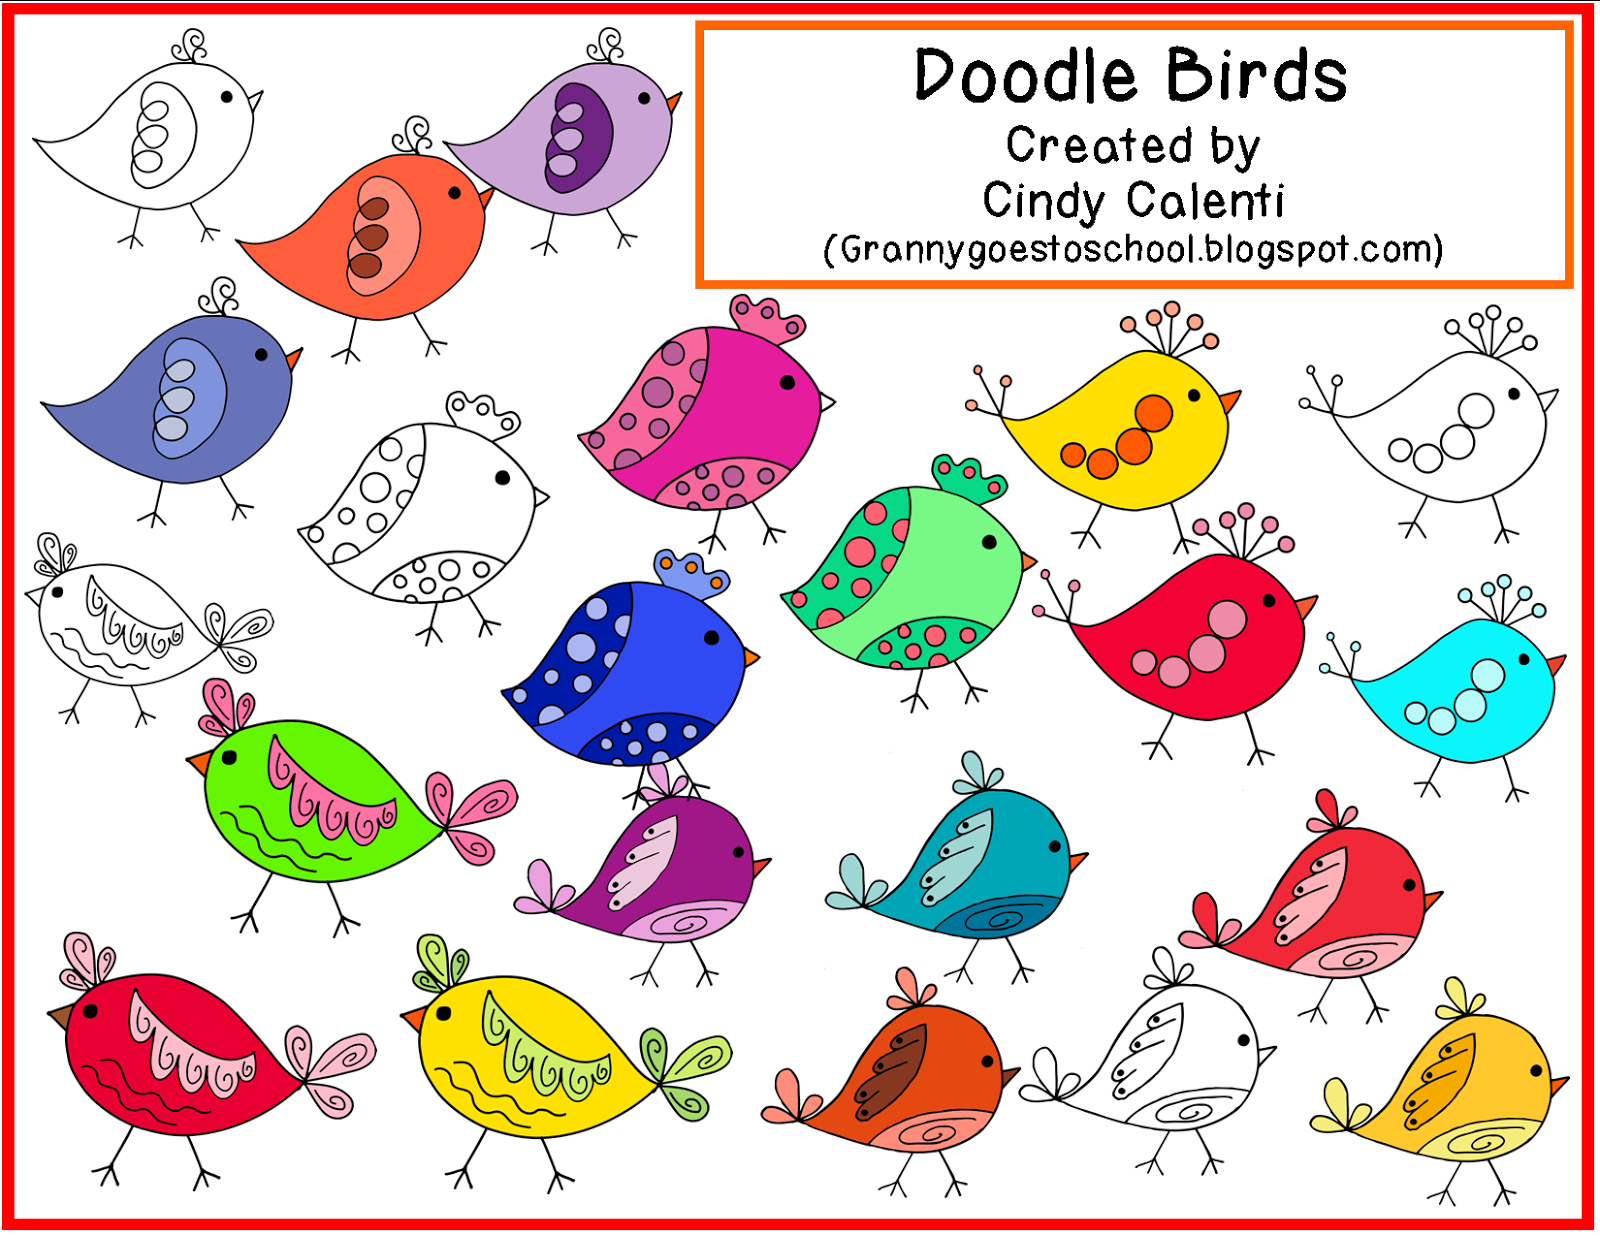 http://3.bp.blogspot.com/-hA-7JxXRjOQ/U9x4U5gOamI/AAAAAAAAFQI/d1Bj3i9ULYE/s1600/doodle.birds.cover.png